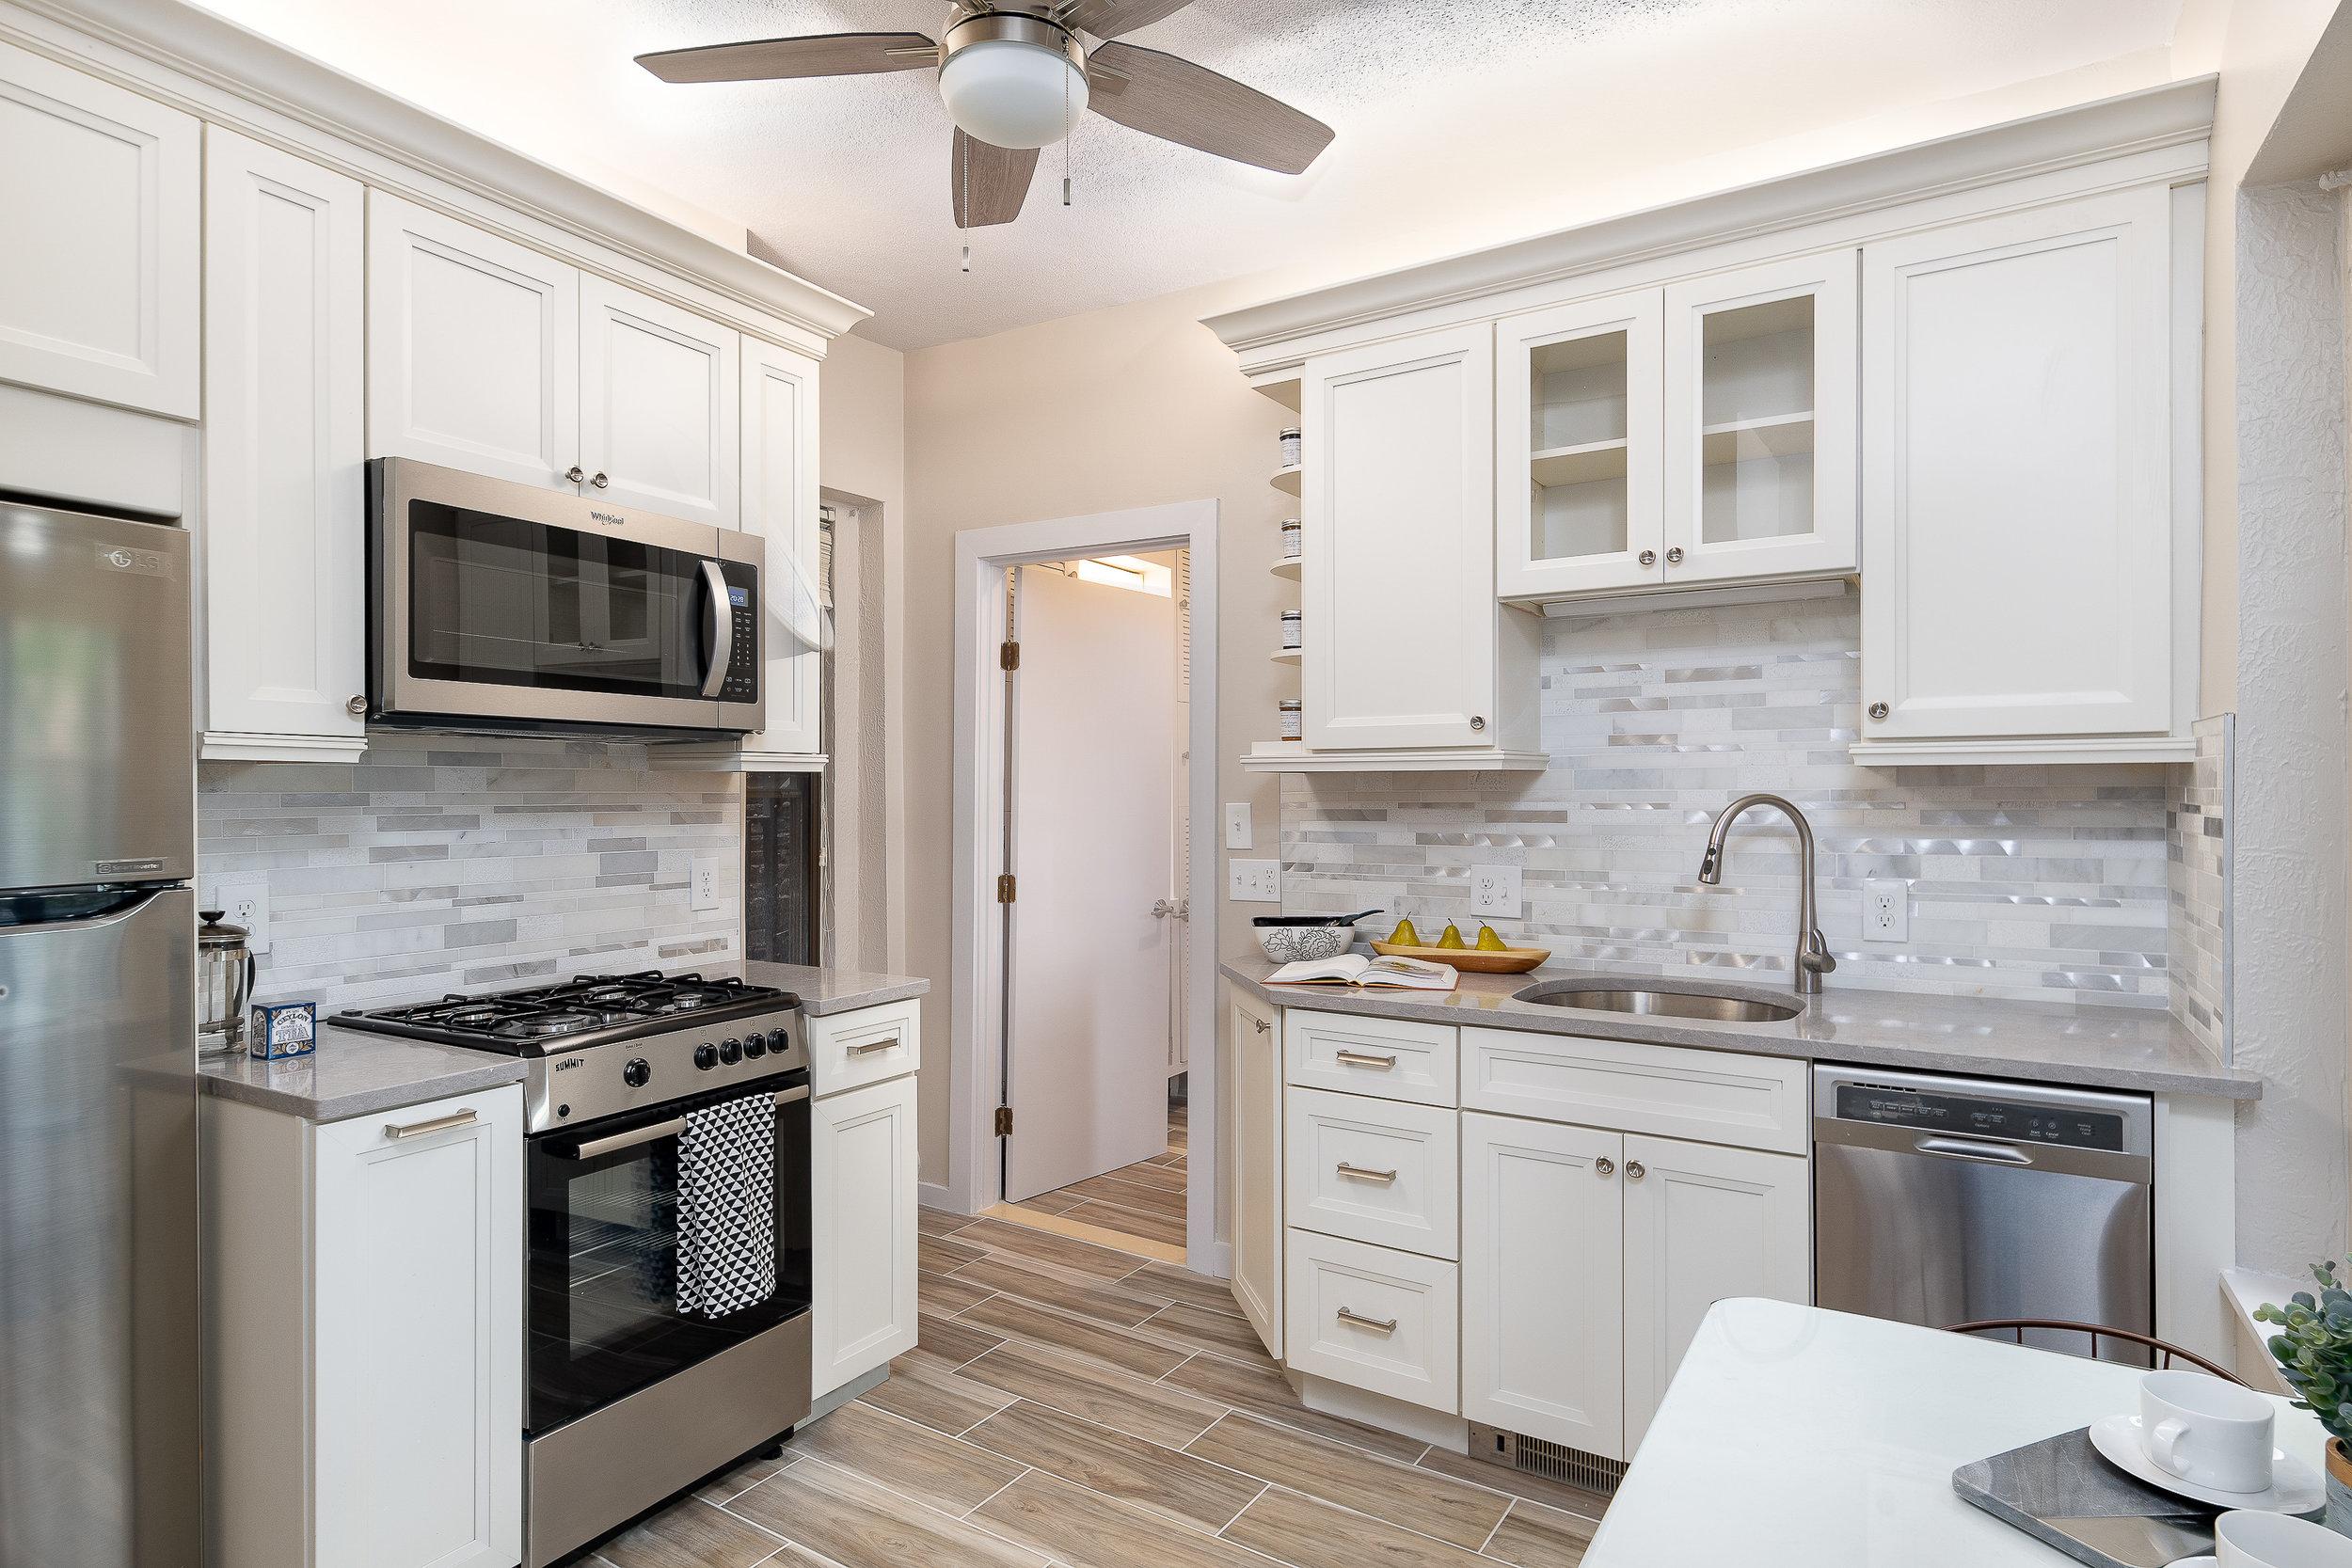 43 Irving St kitchen.jpg